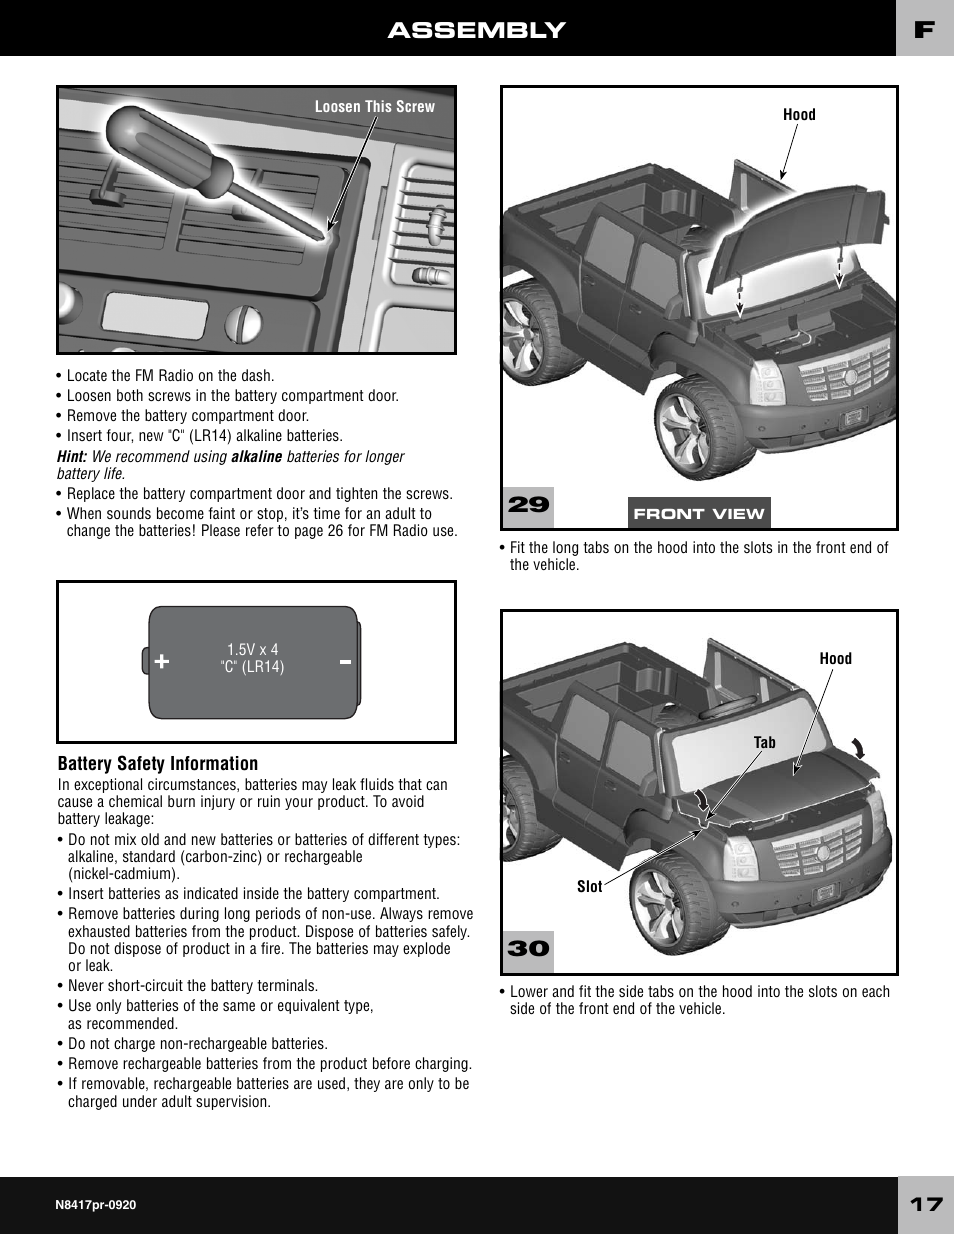 Modified Power Wheels Manual Guide